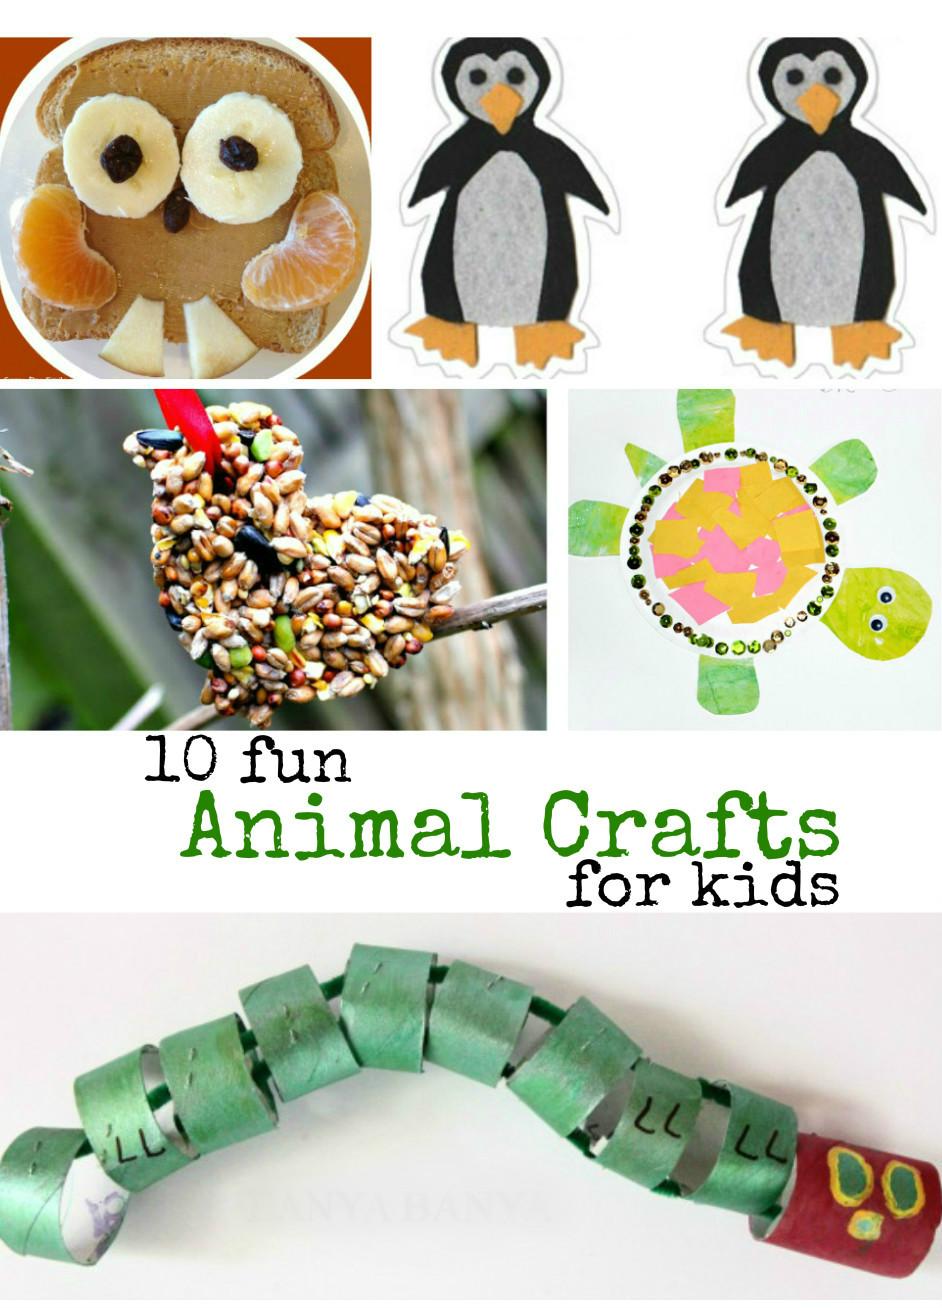 10 Fun Animal Crafts